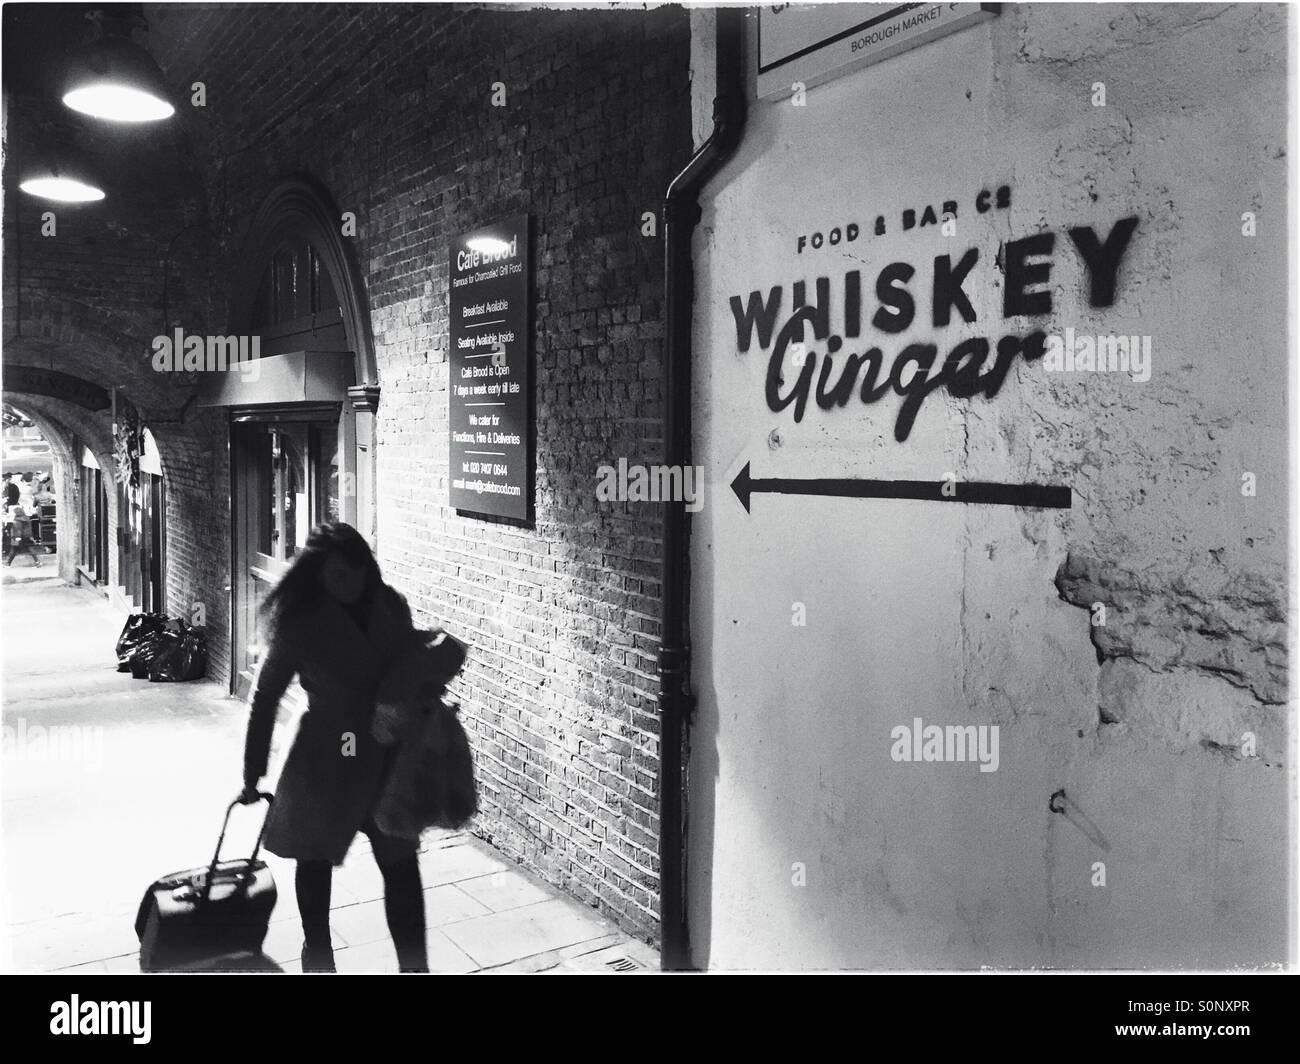 Woman  dragging luggage,London,England - Stock Image